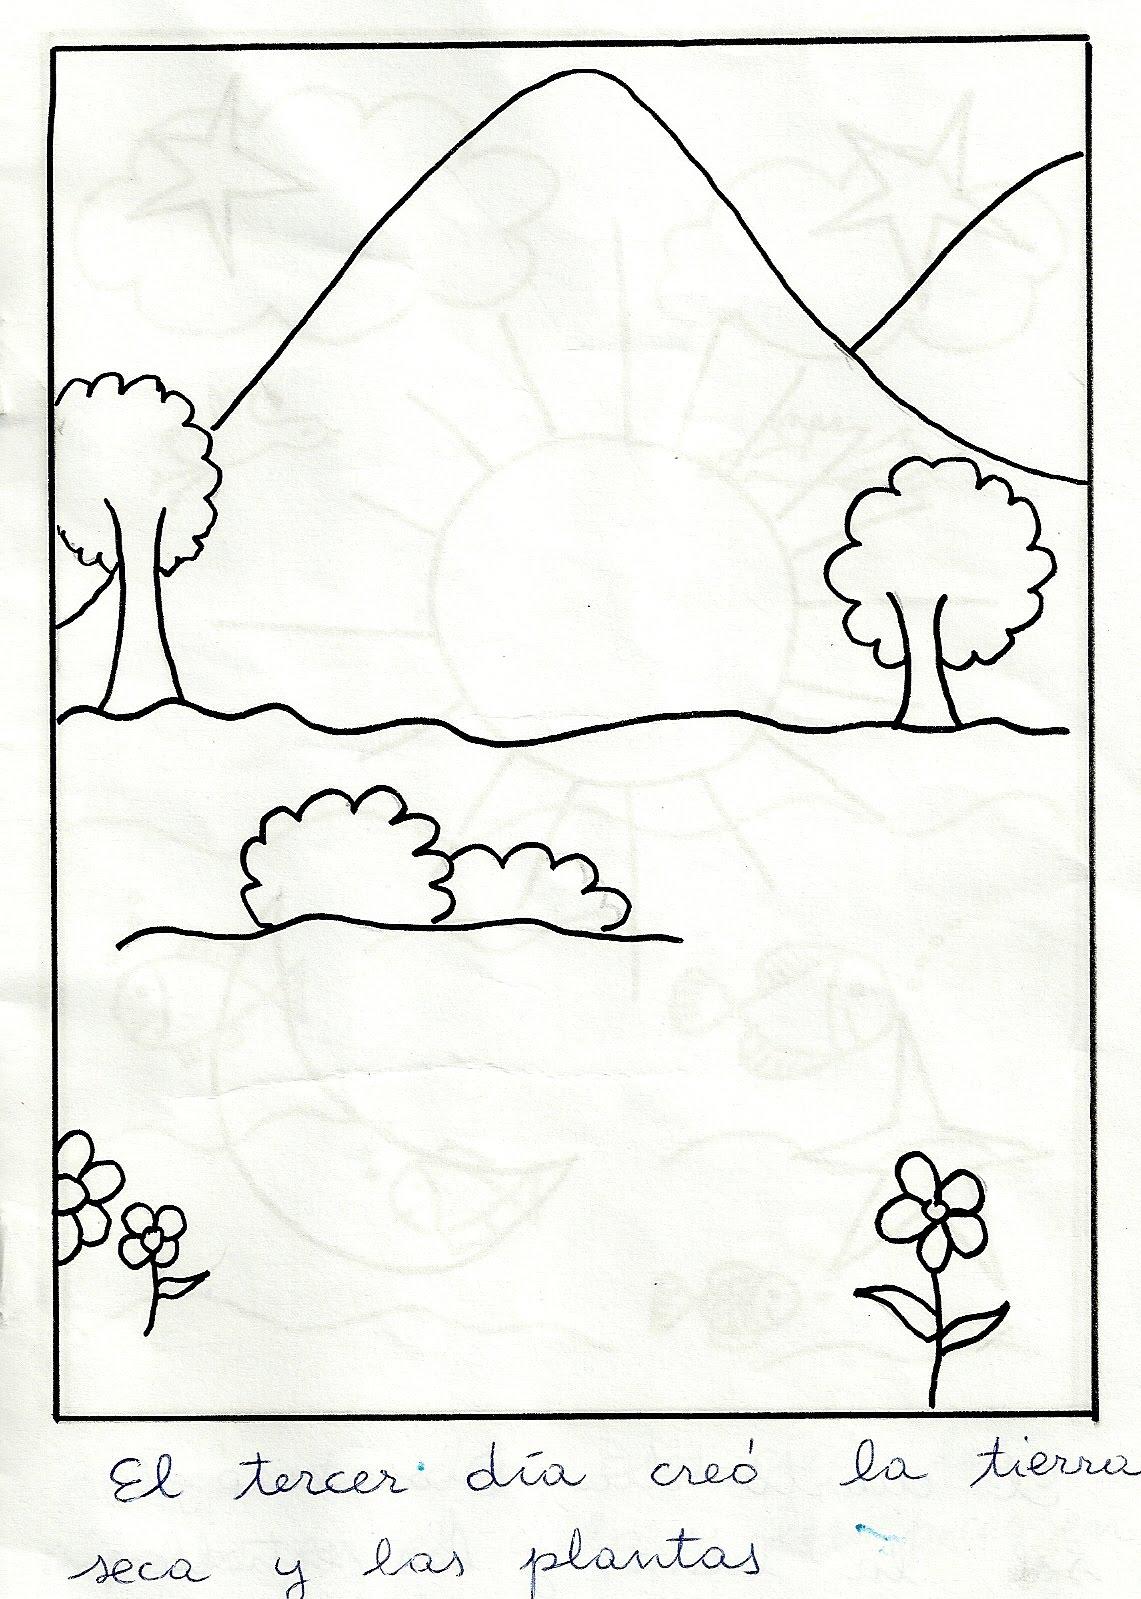 Famoso Creación De Páginas Para Colorear Composición - Dibujos Para ...